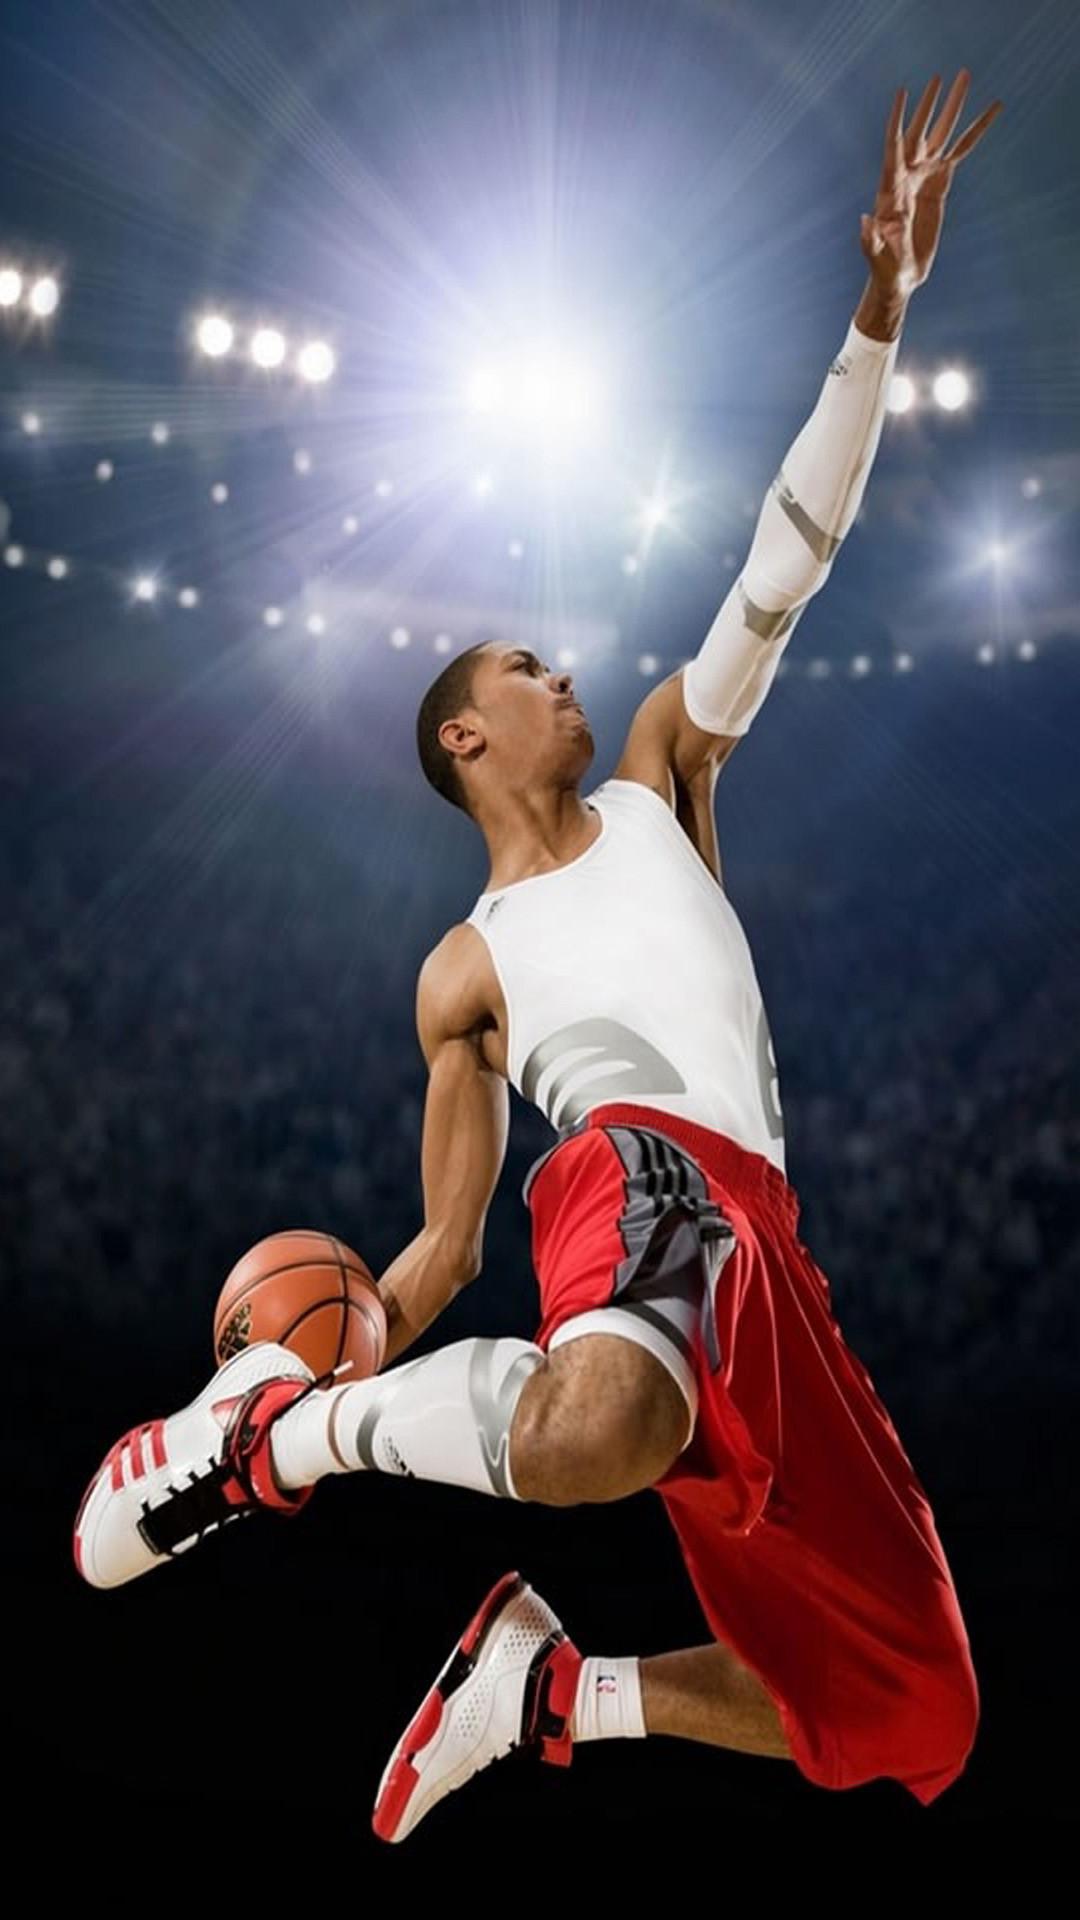 0 USA Basketball Team | Kobe Bryant iPhone 4 Wallpaper Wonderful basketball  Wallpapers for iPhone 6 Plus, iPhone 6 Plus .